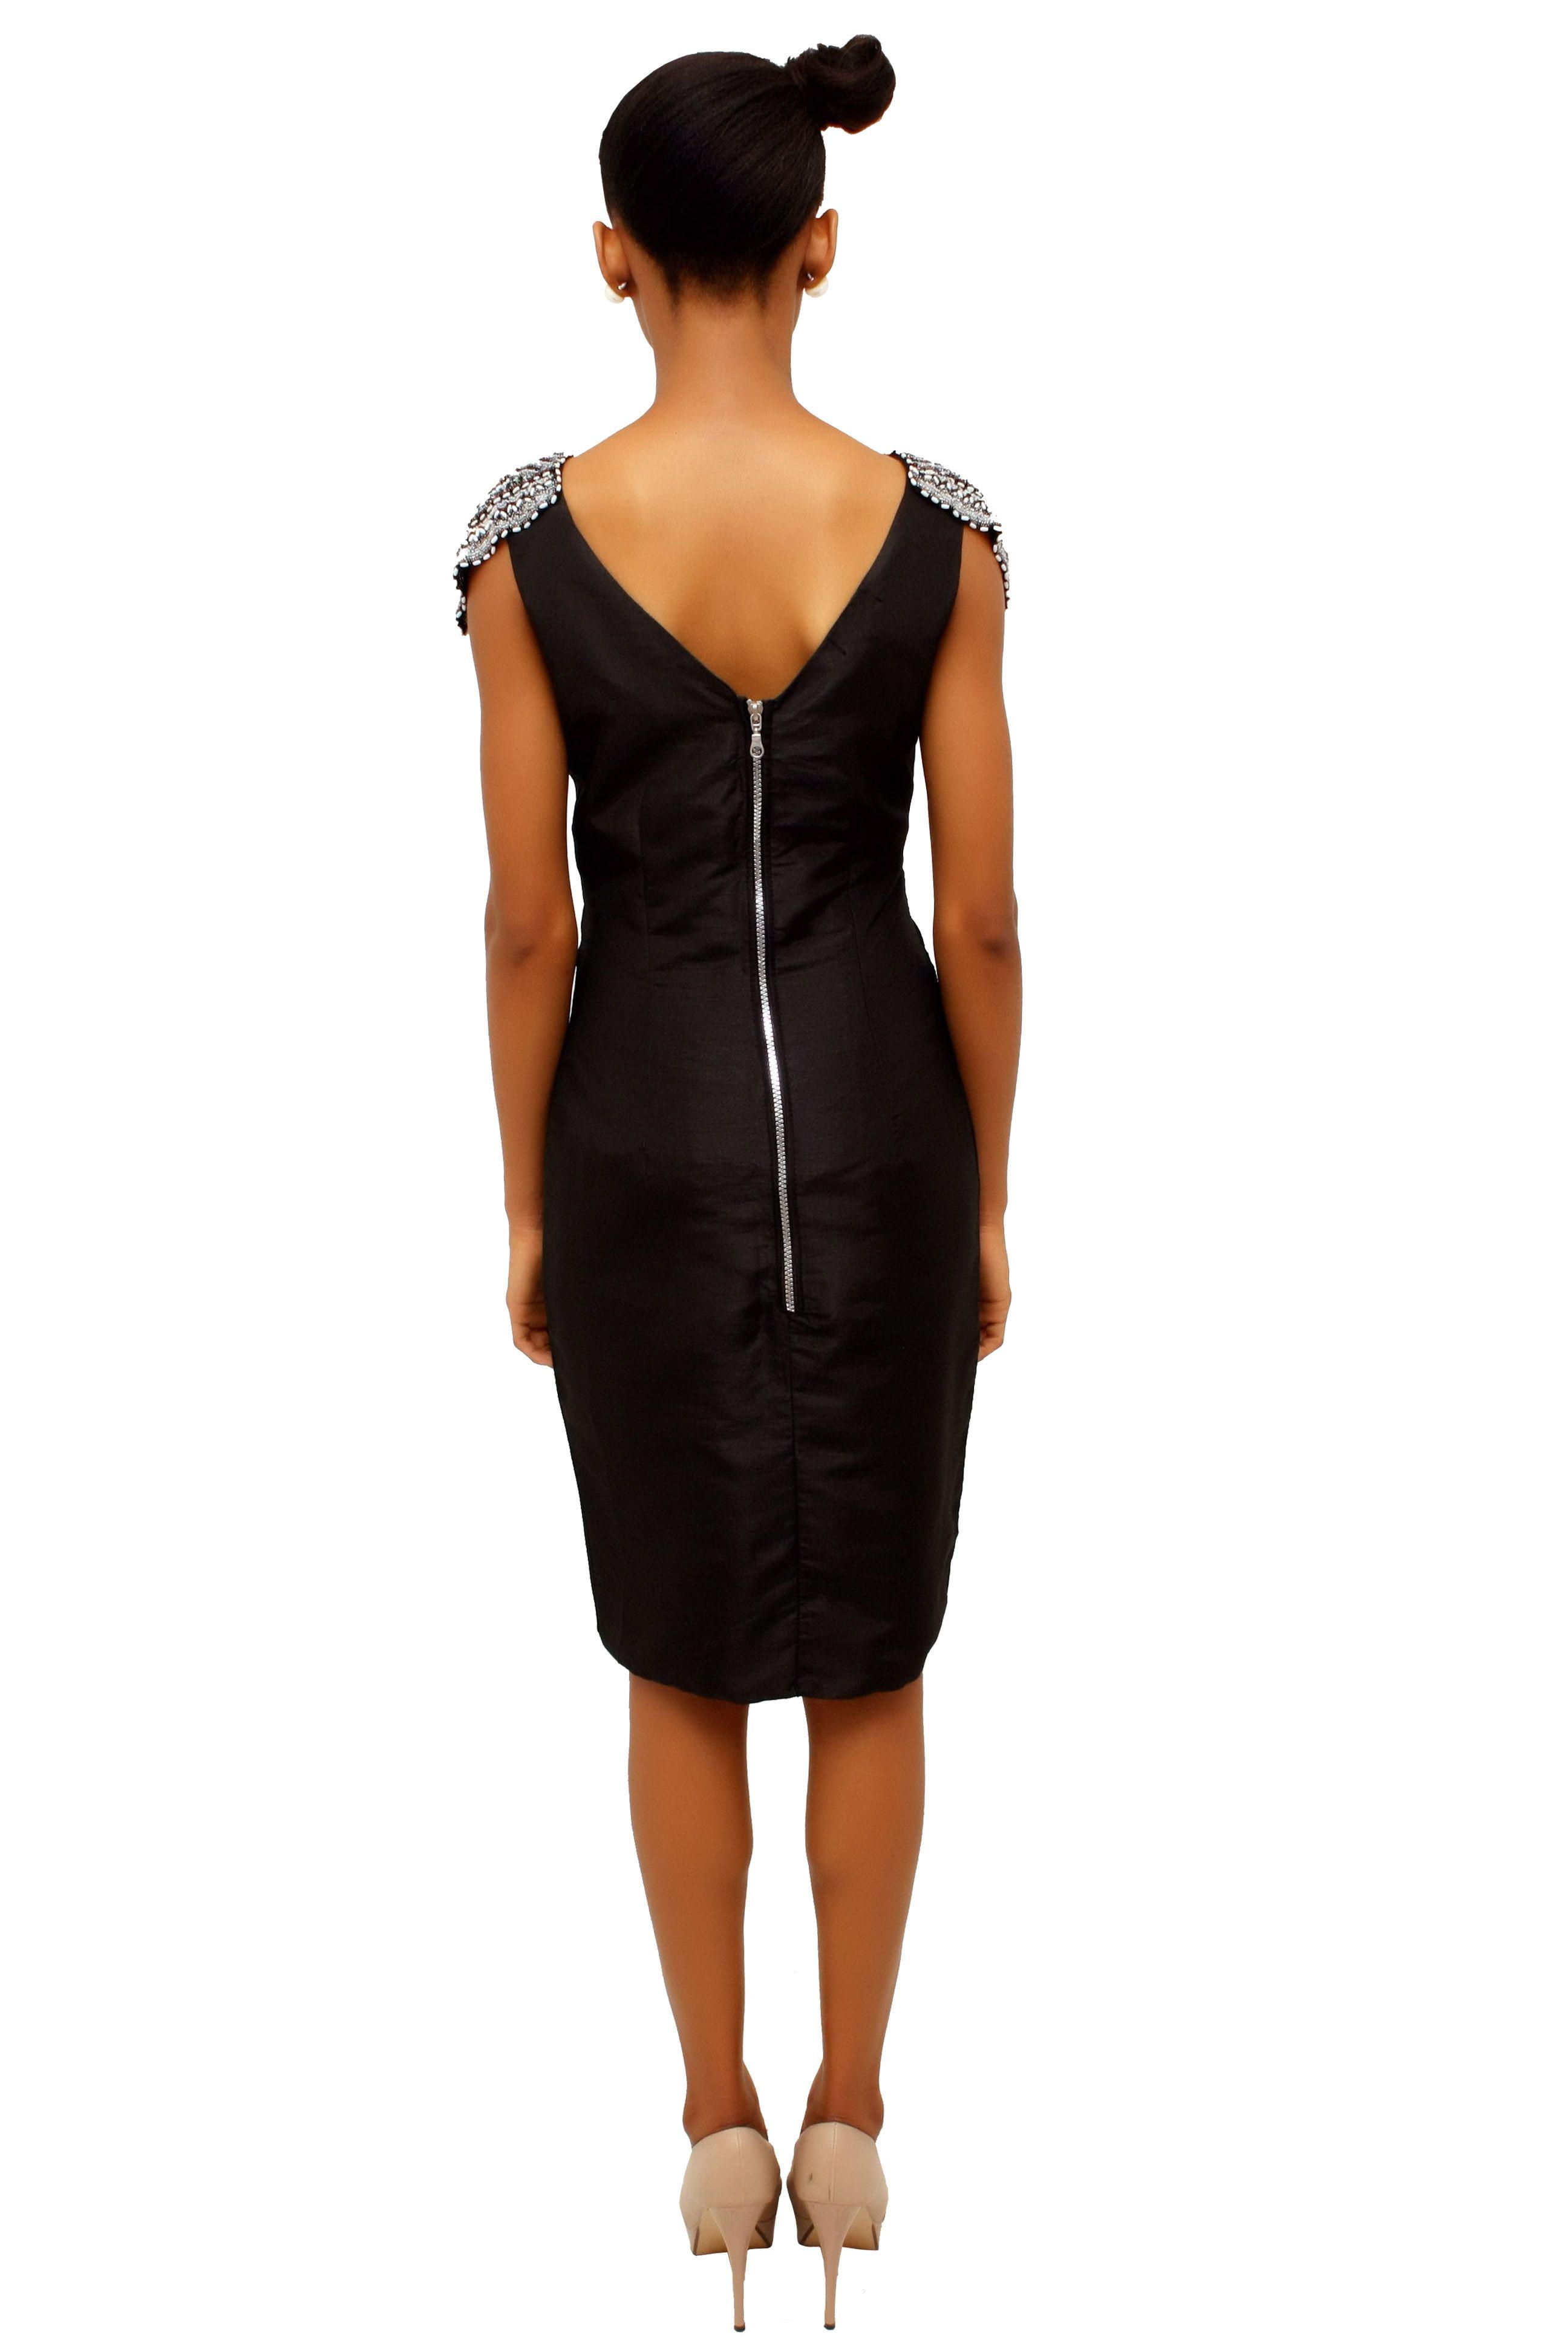 Shoulder Patch Dress Awesome Metal Zipper Up The Back Patch Dress Fashion Little Black Dress [ 3888 x 2592 Pixel ]